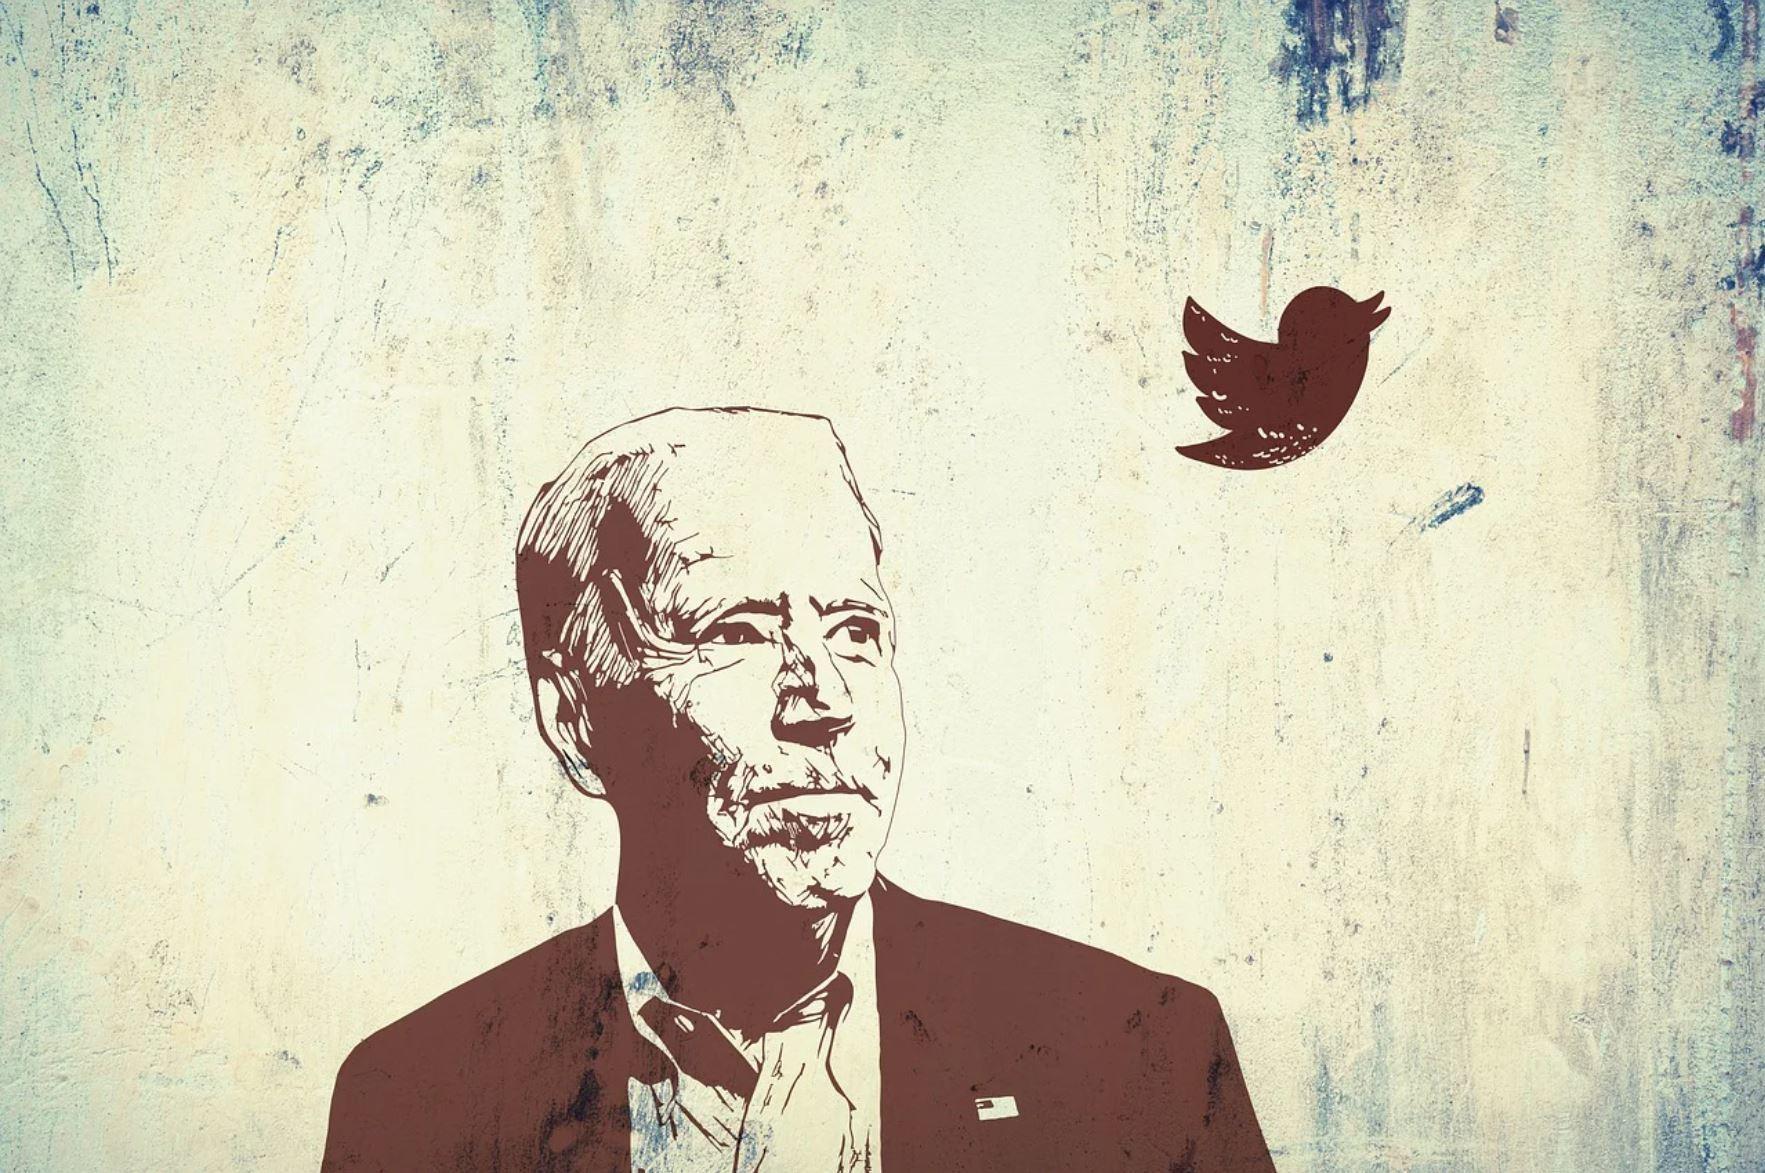 President Biden. Image by tiburi on Pixabay.com